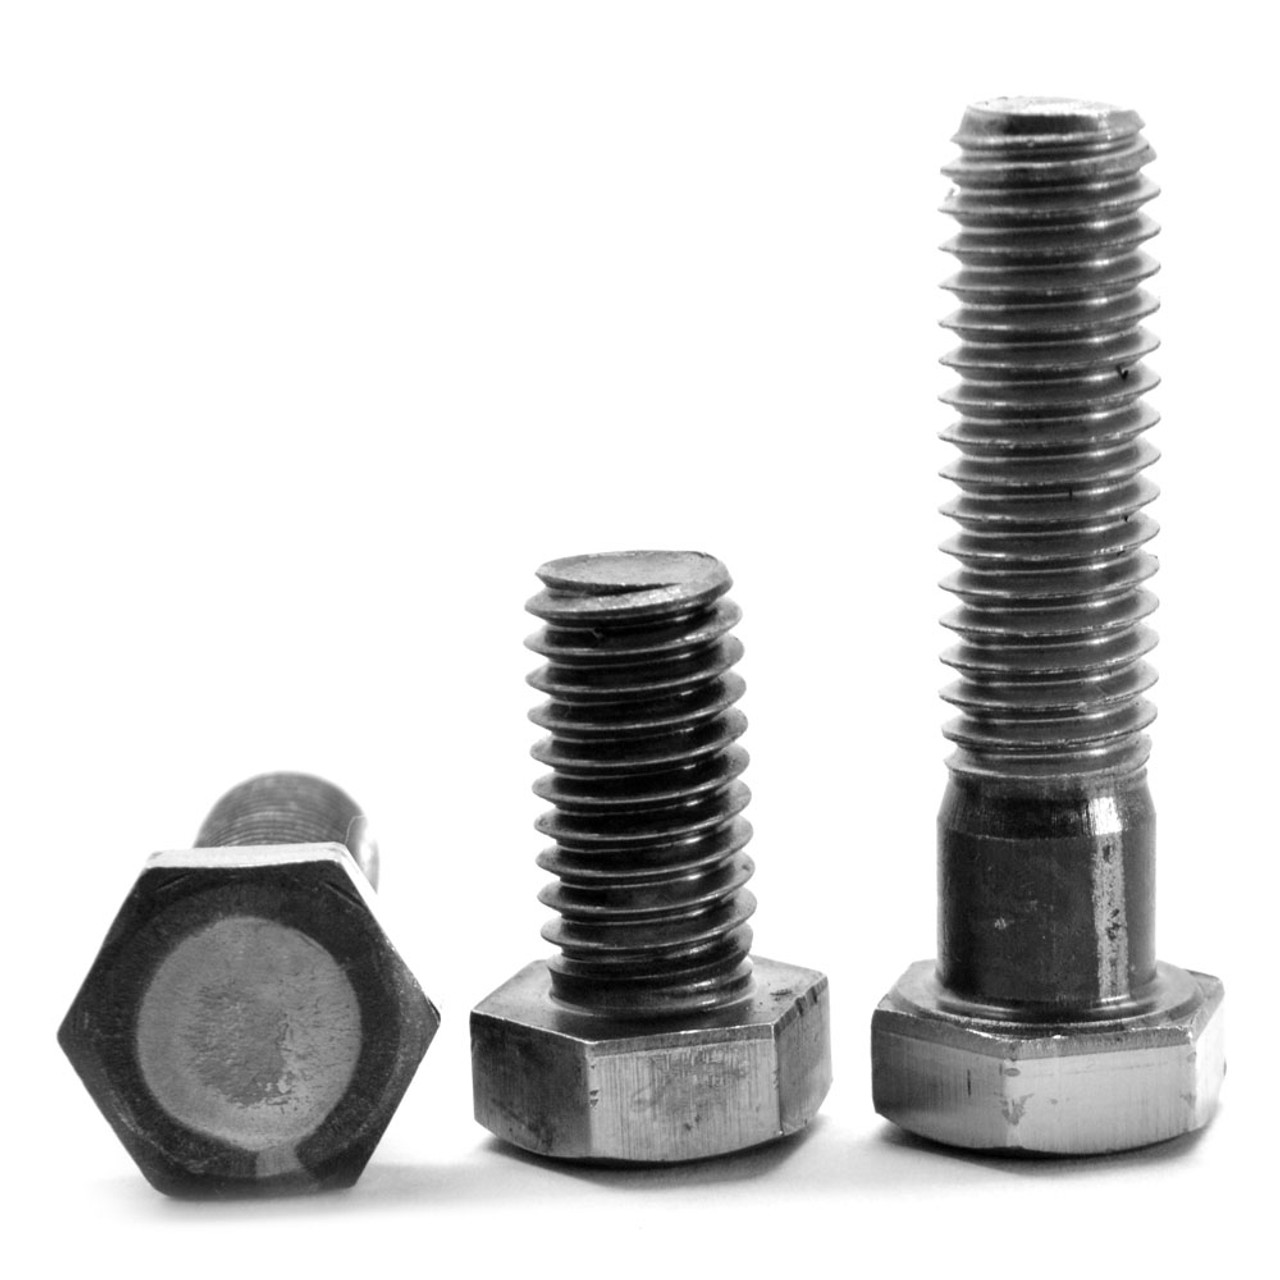 "1 1/2""-6 x 10"" (PT) Coarse Thread A307 Grade A Hex Bolt Low Carbon Steel Plain Finish"